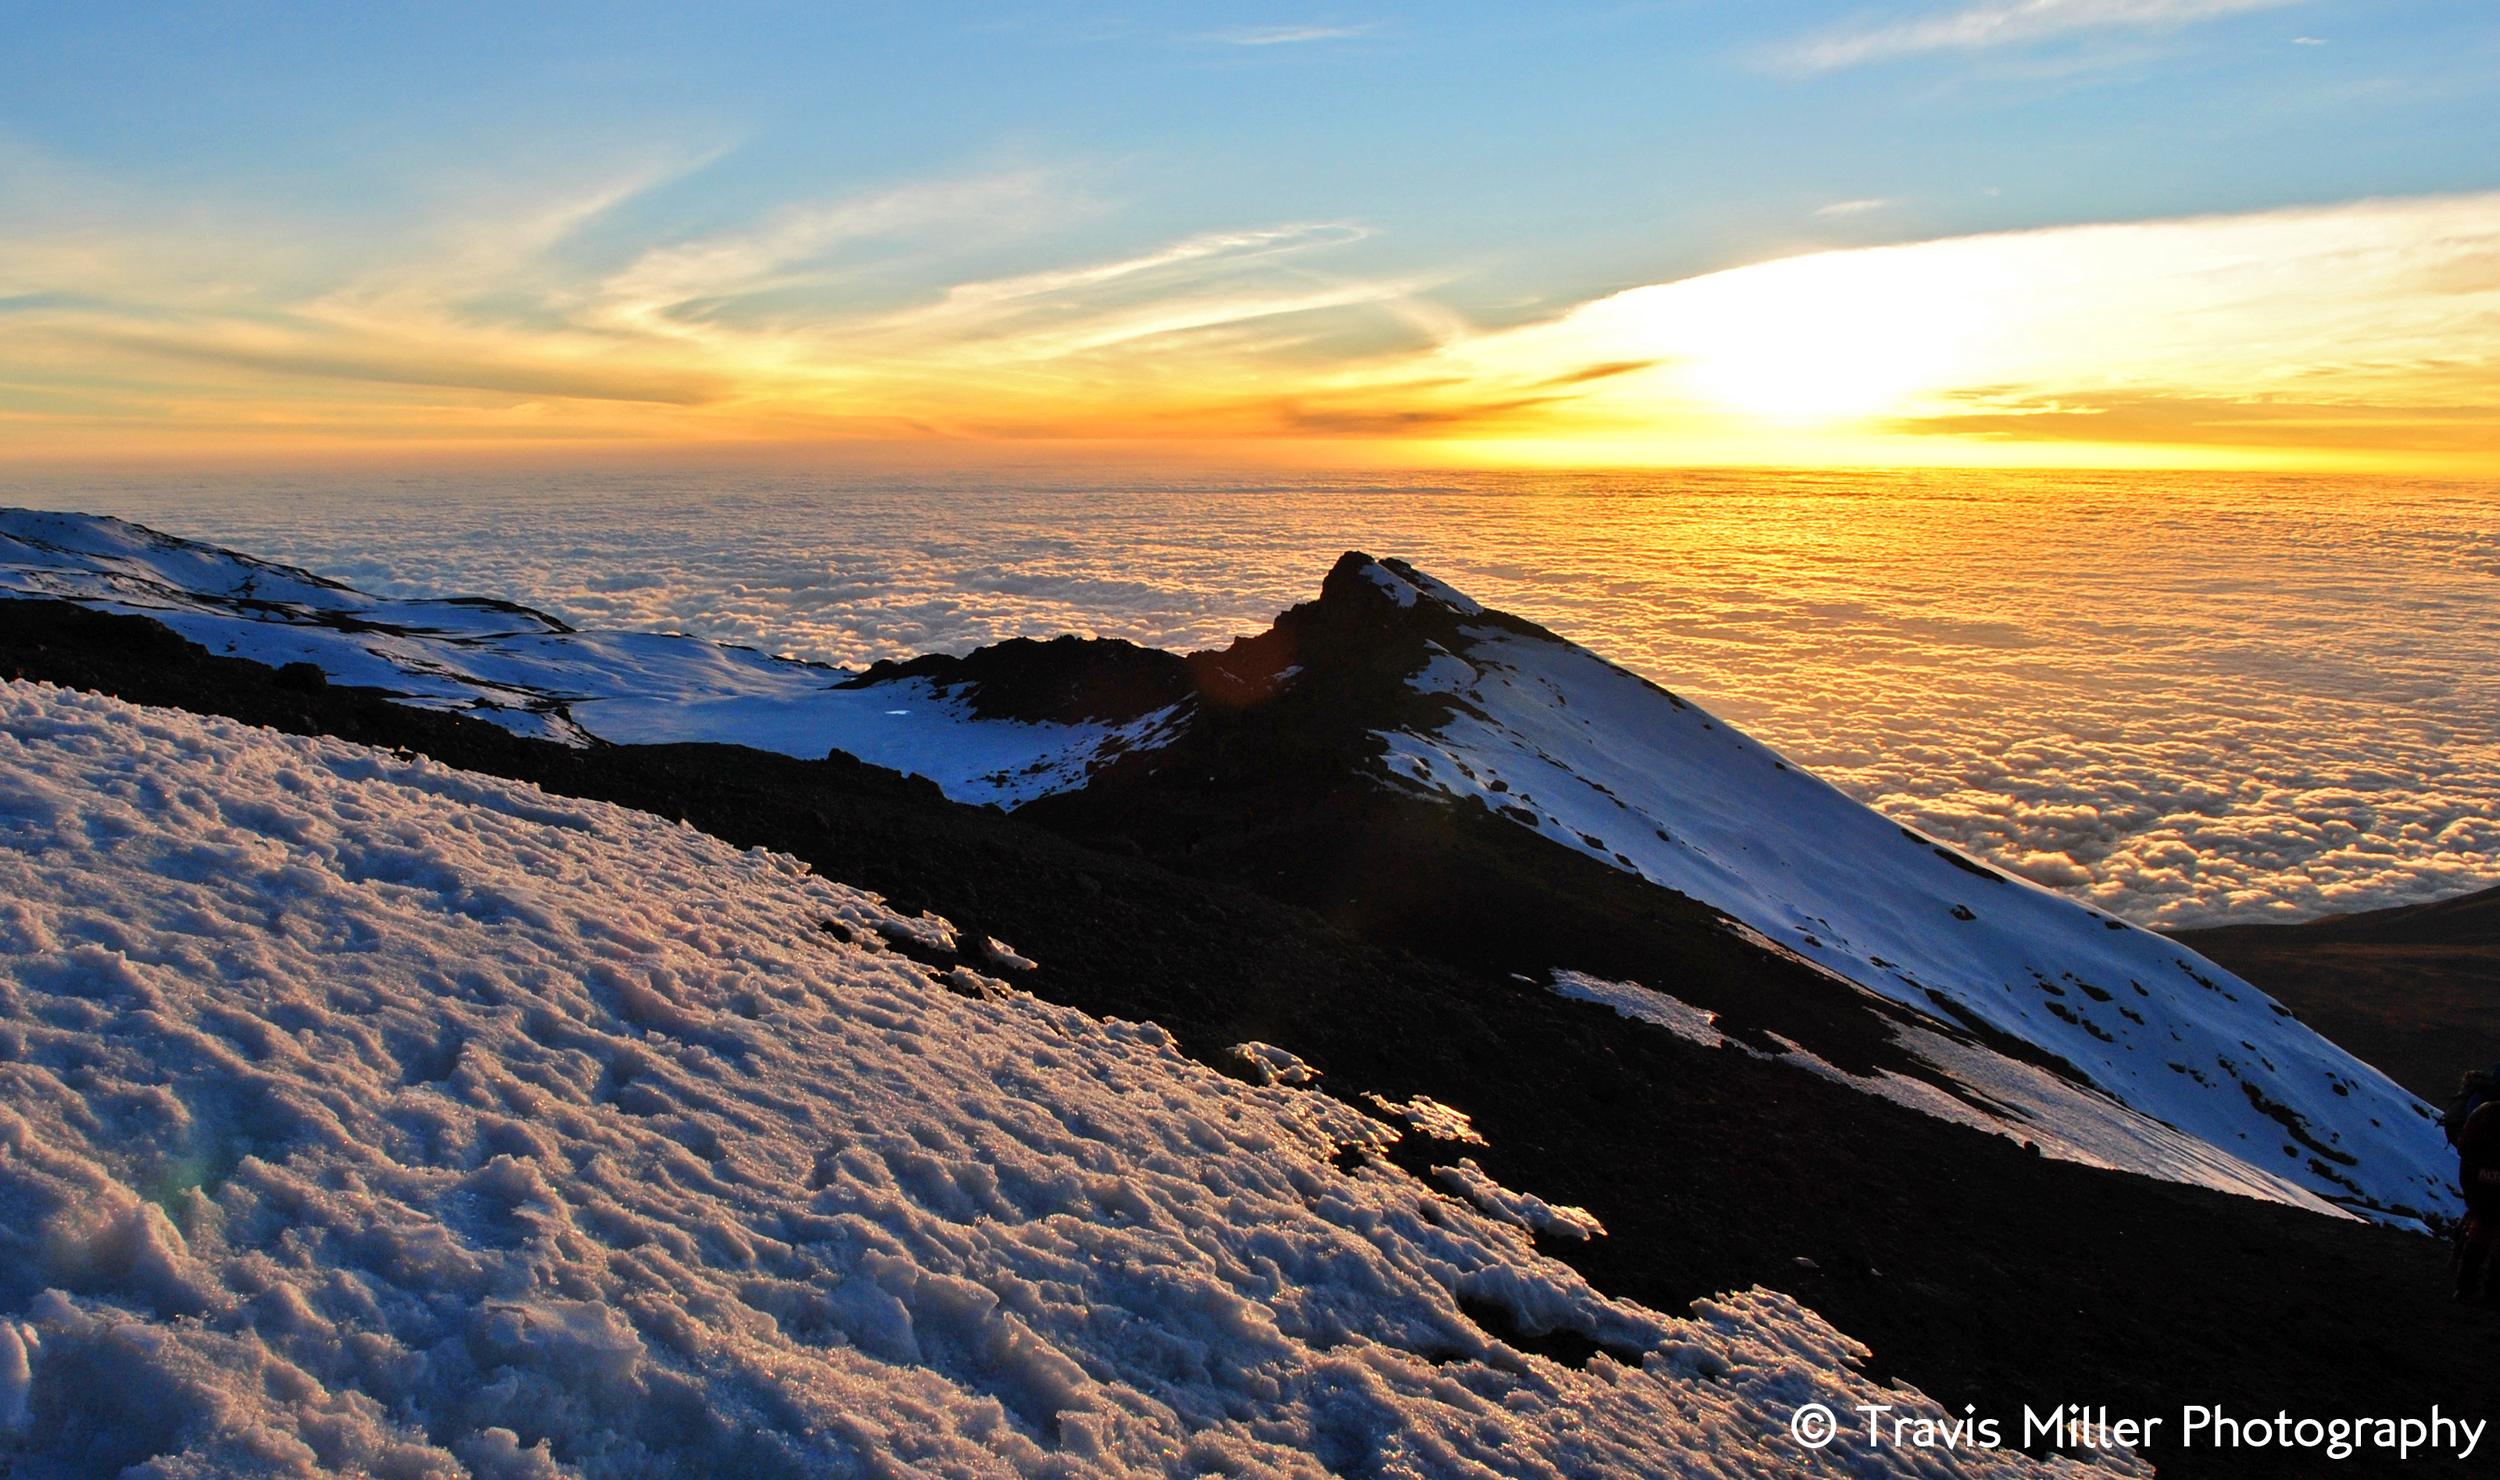 The Roof of Africa /   Mount Kilimanjaro, Tanzania